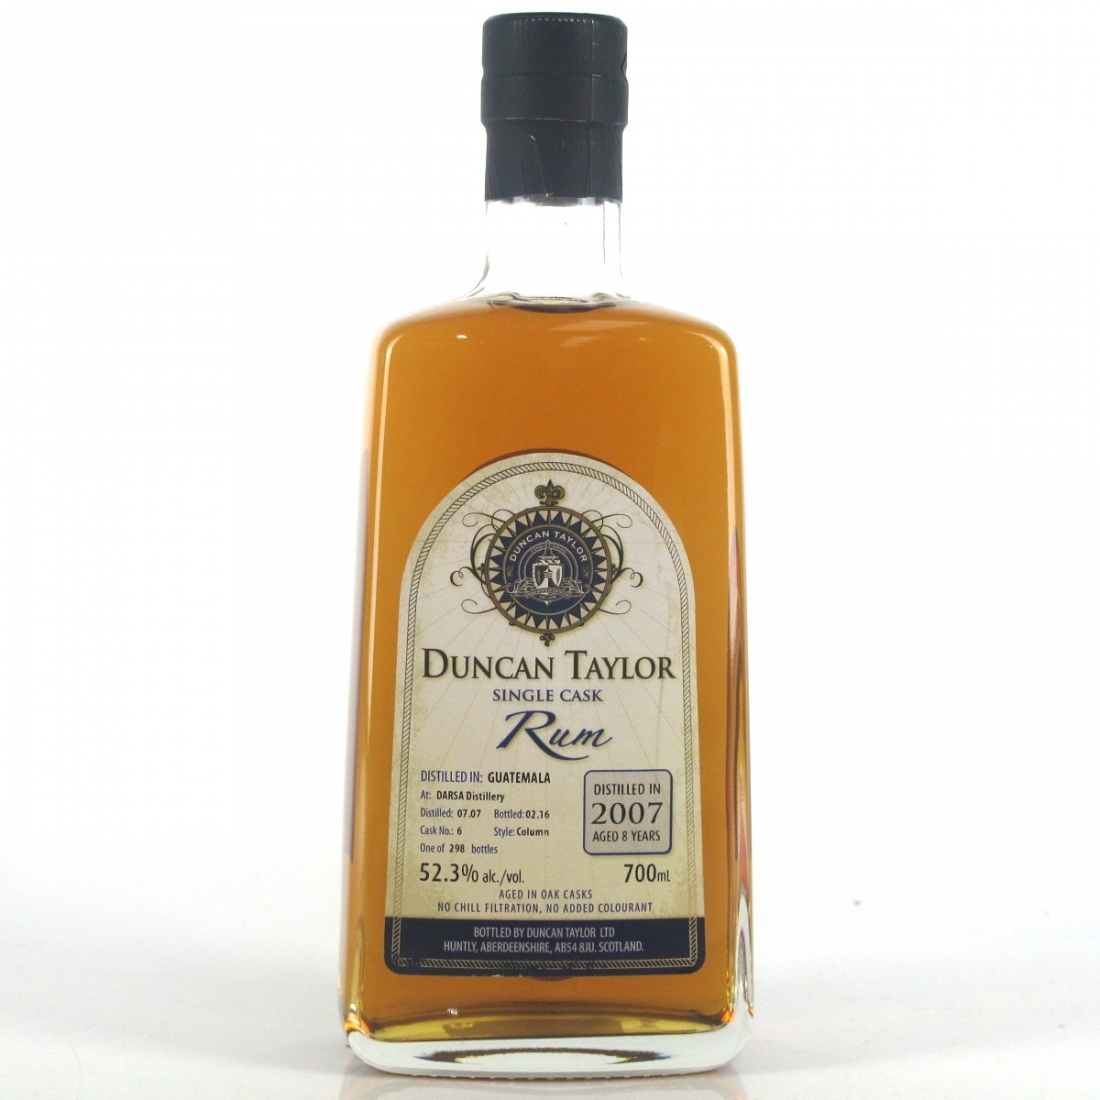 Darsa 2007 Duncan Taylor 8 Year Old Single Cask Rum